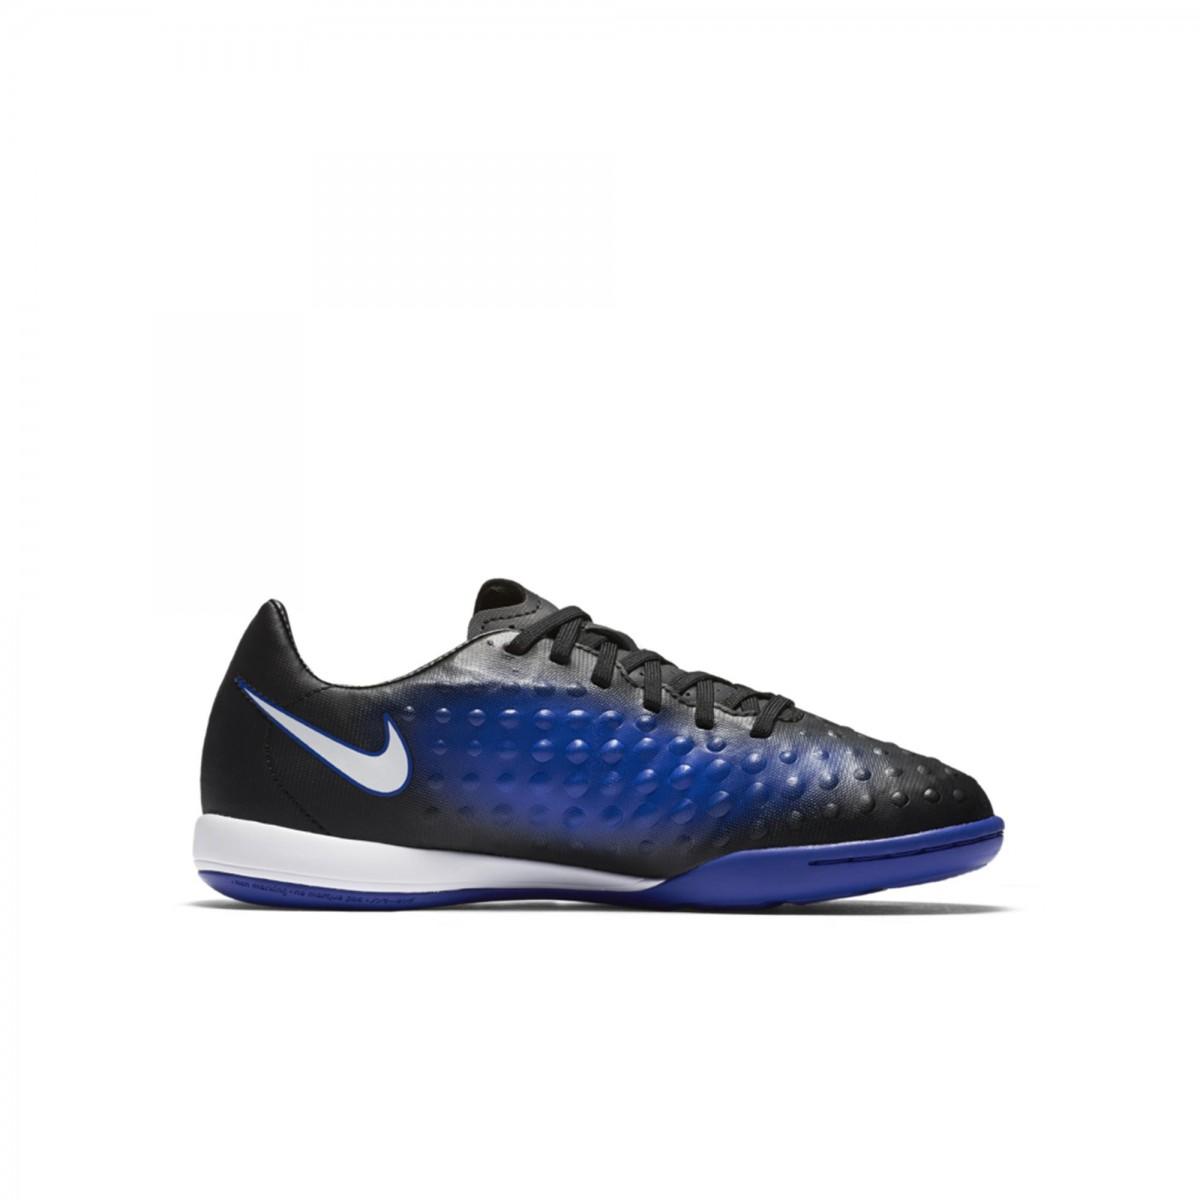 23457cab0e769 Bizz Store - Chuteira Futsal Infantil Nike MagistaX Opus II JR